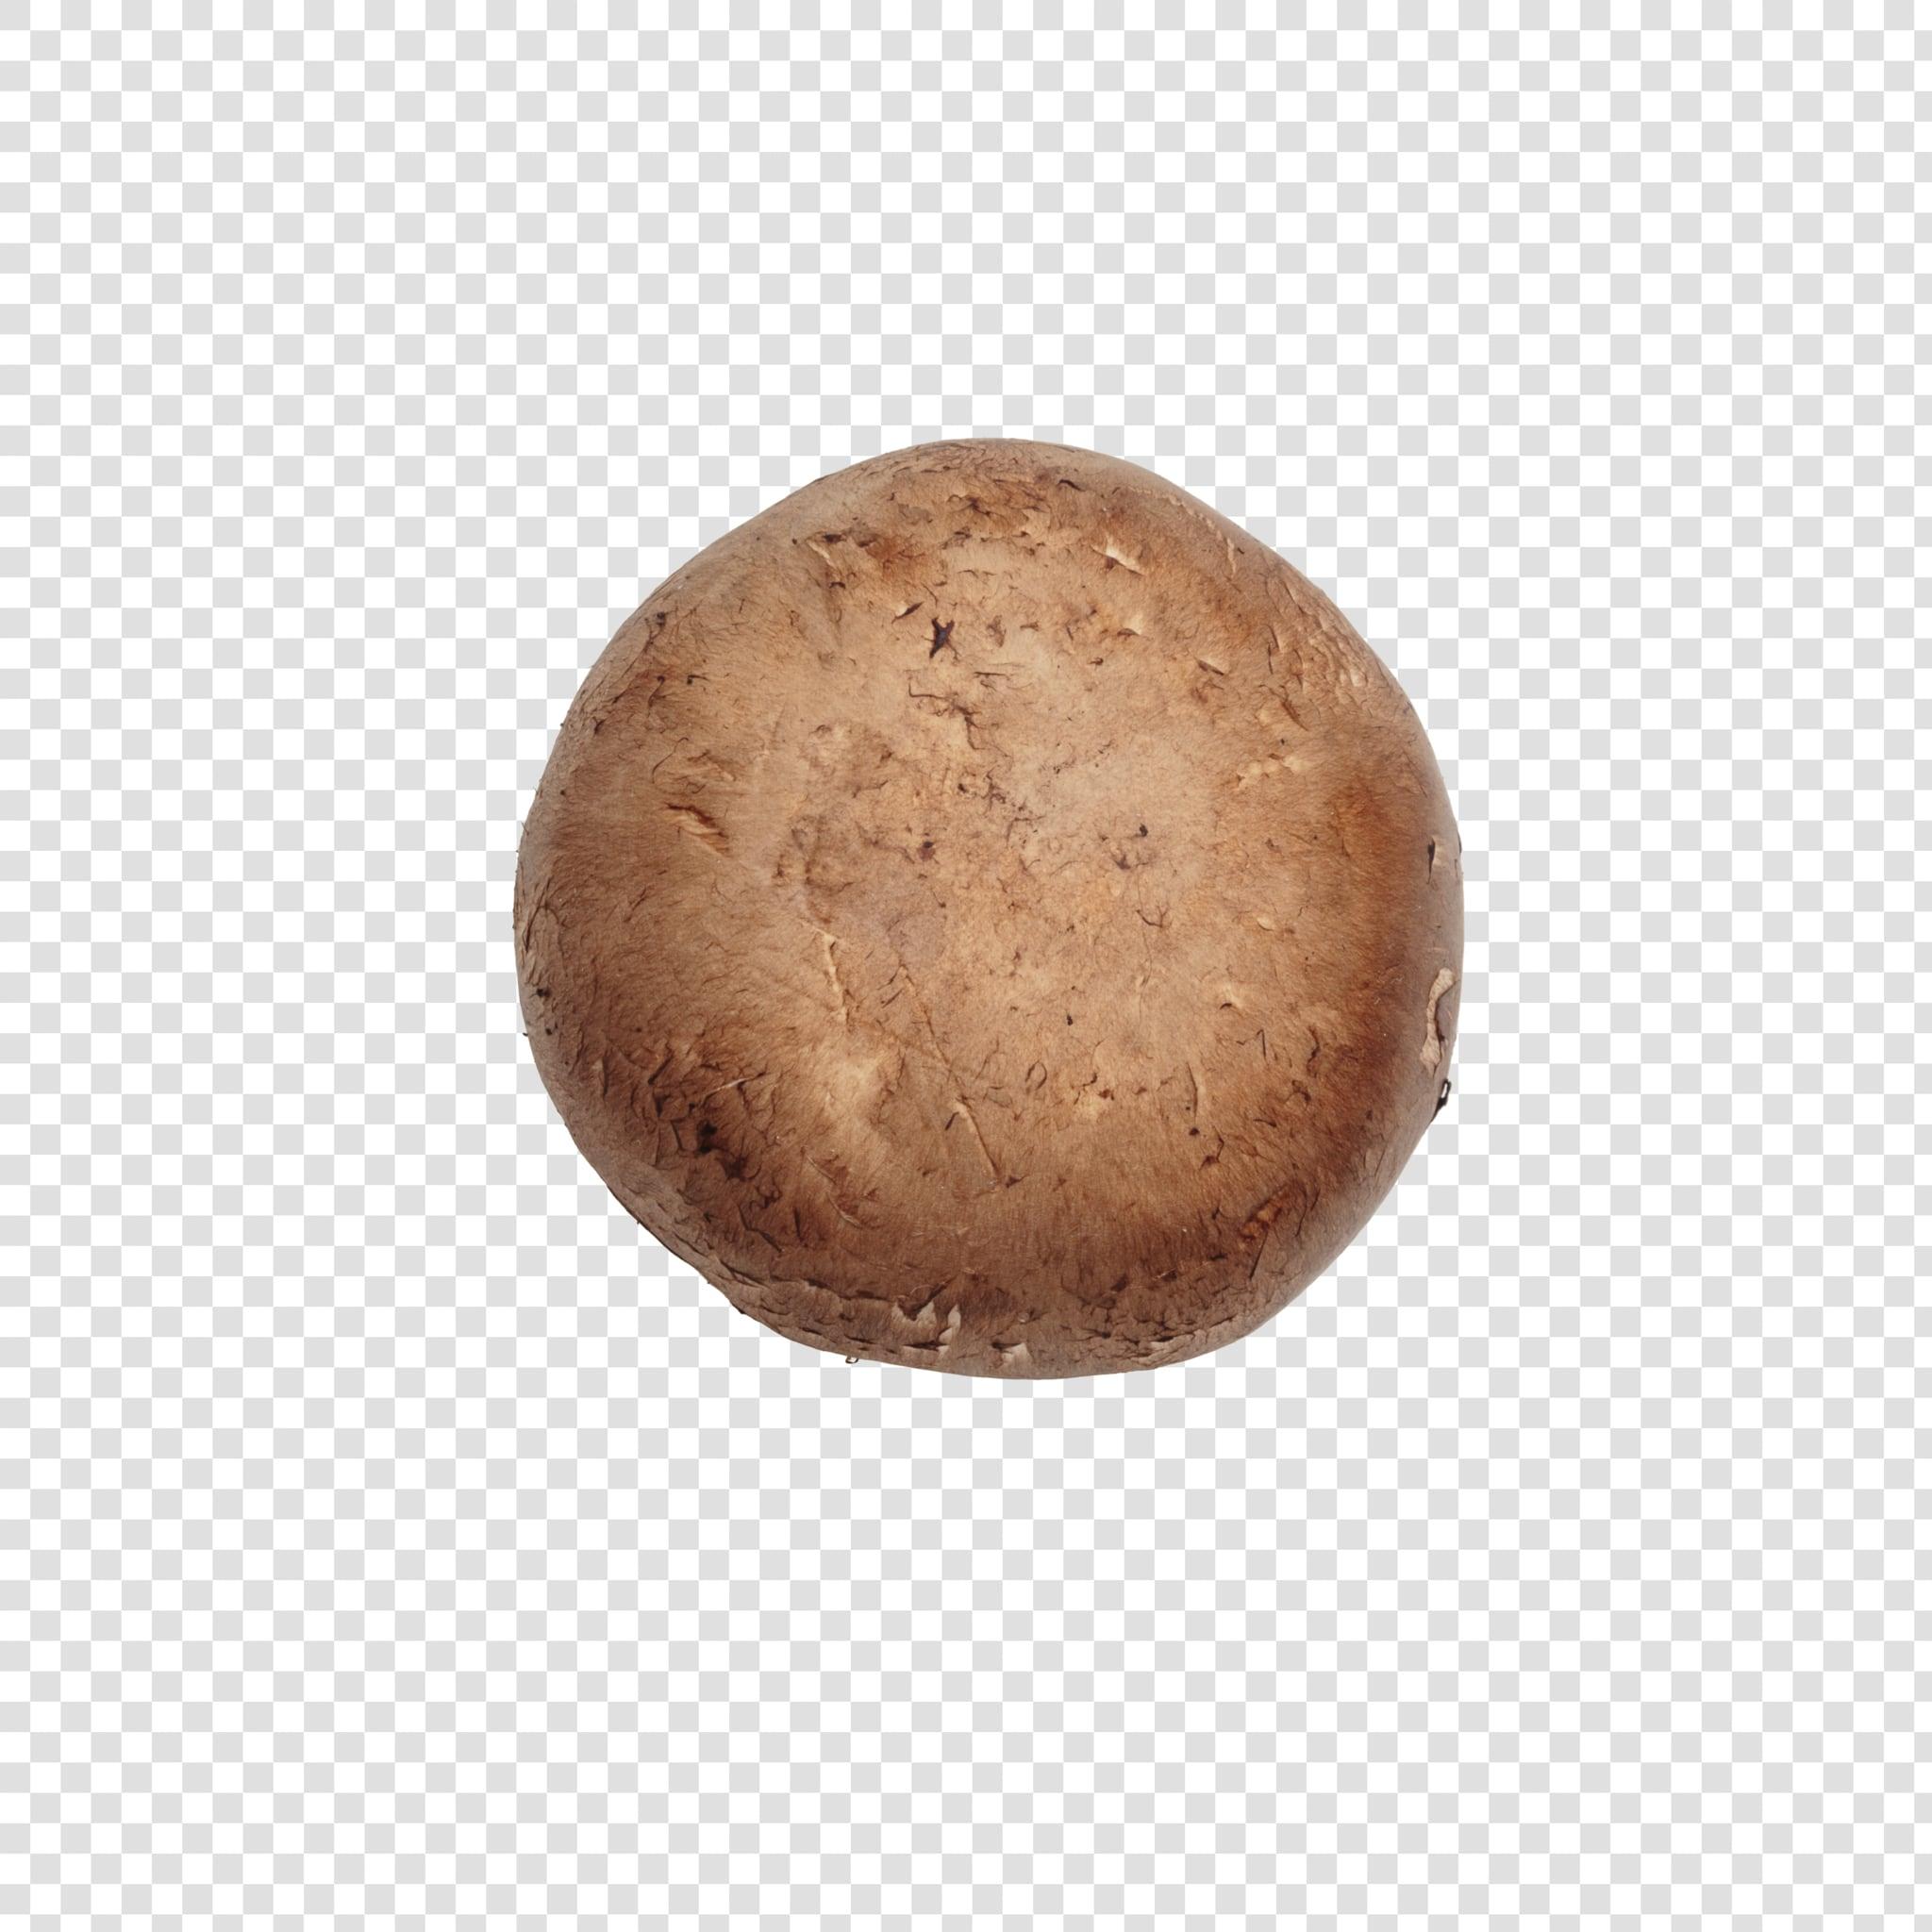 Champignon image with transparent background